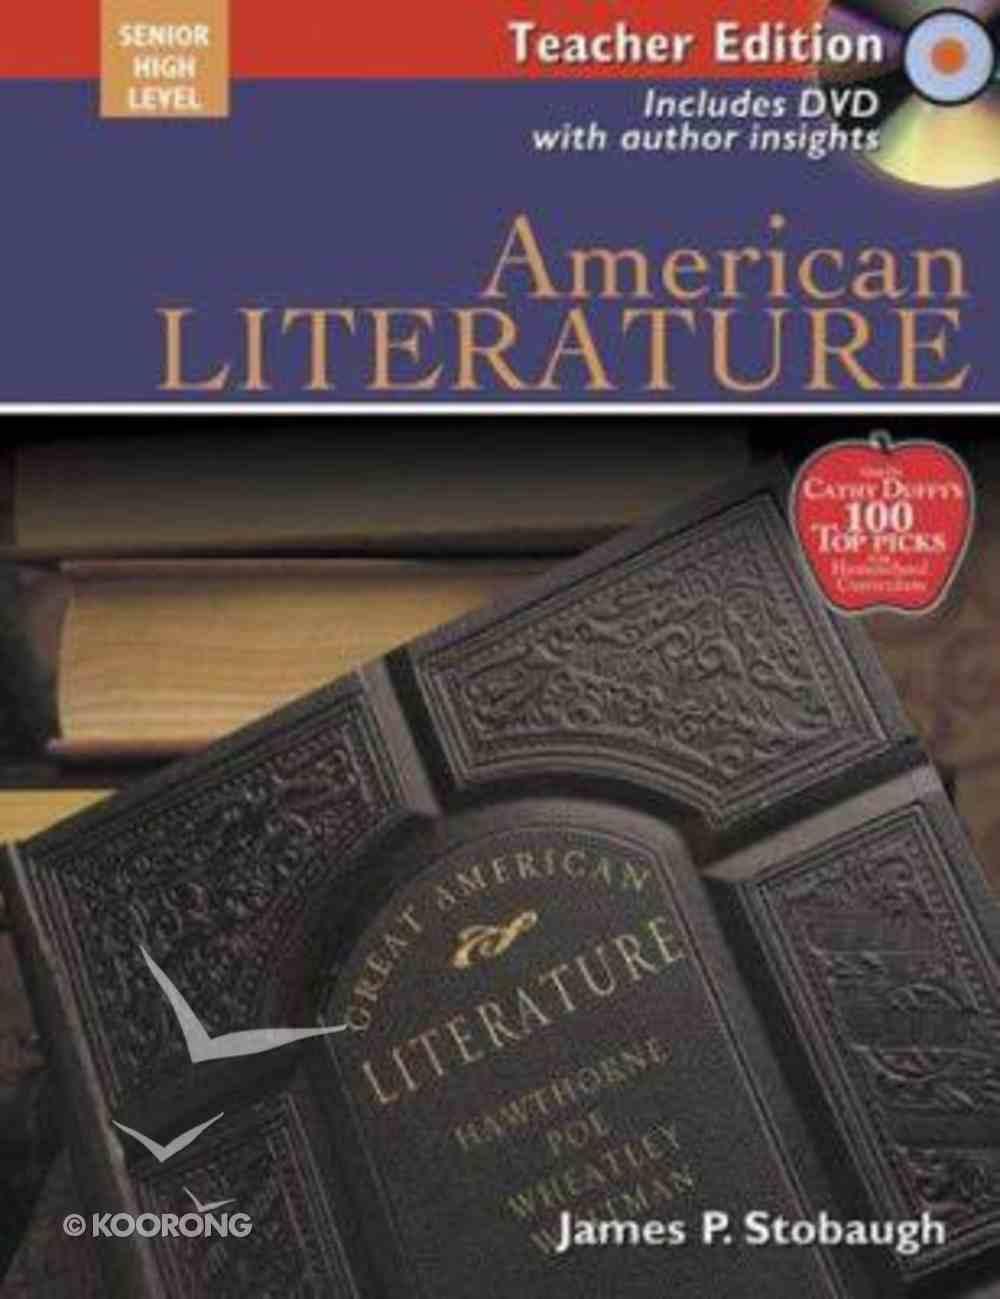 American Literature Teacher Edition (Senior High Level) Paperback